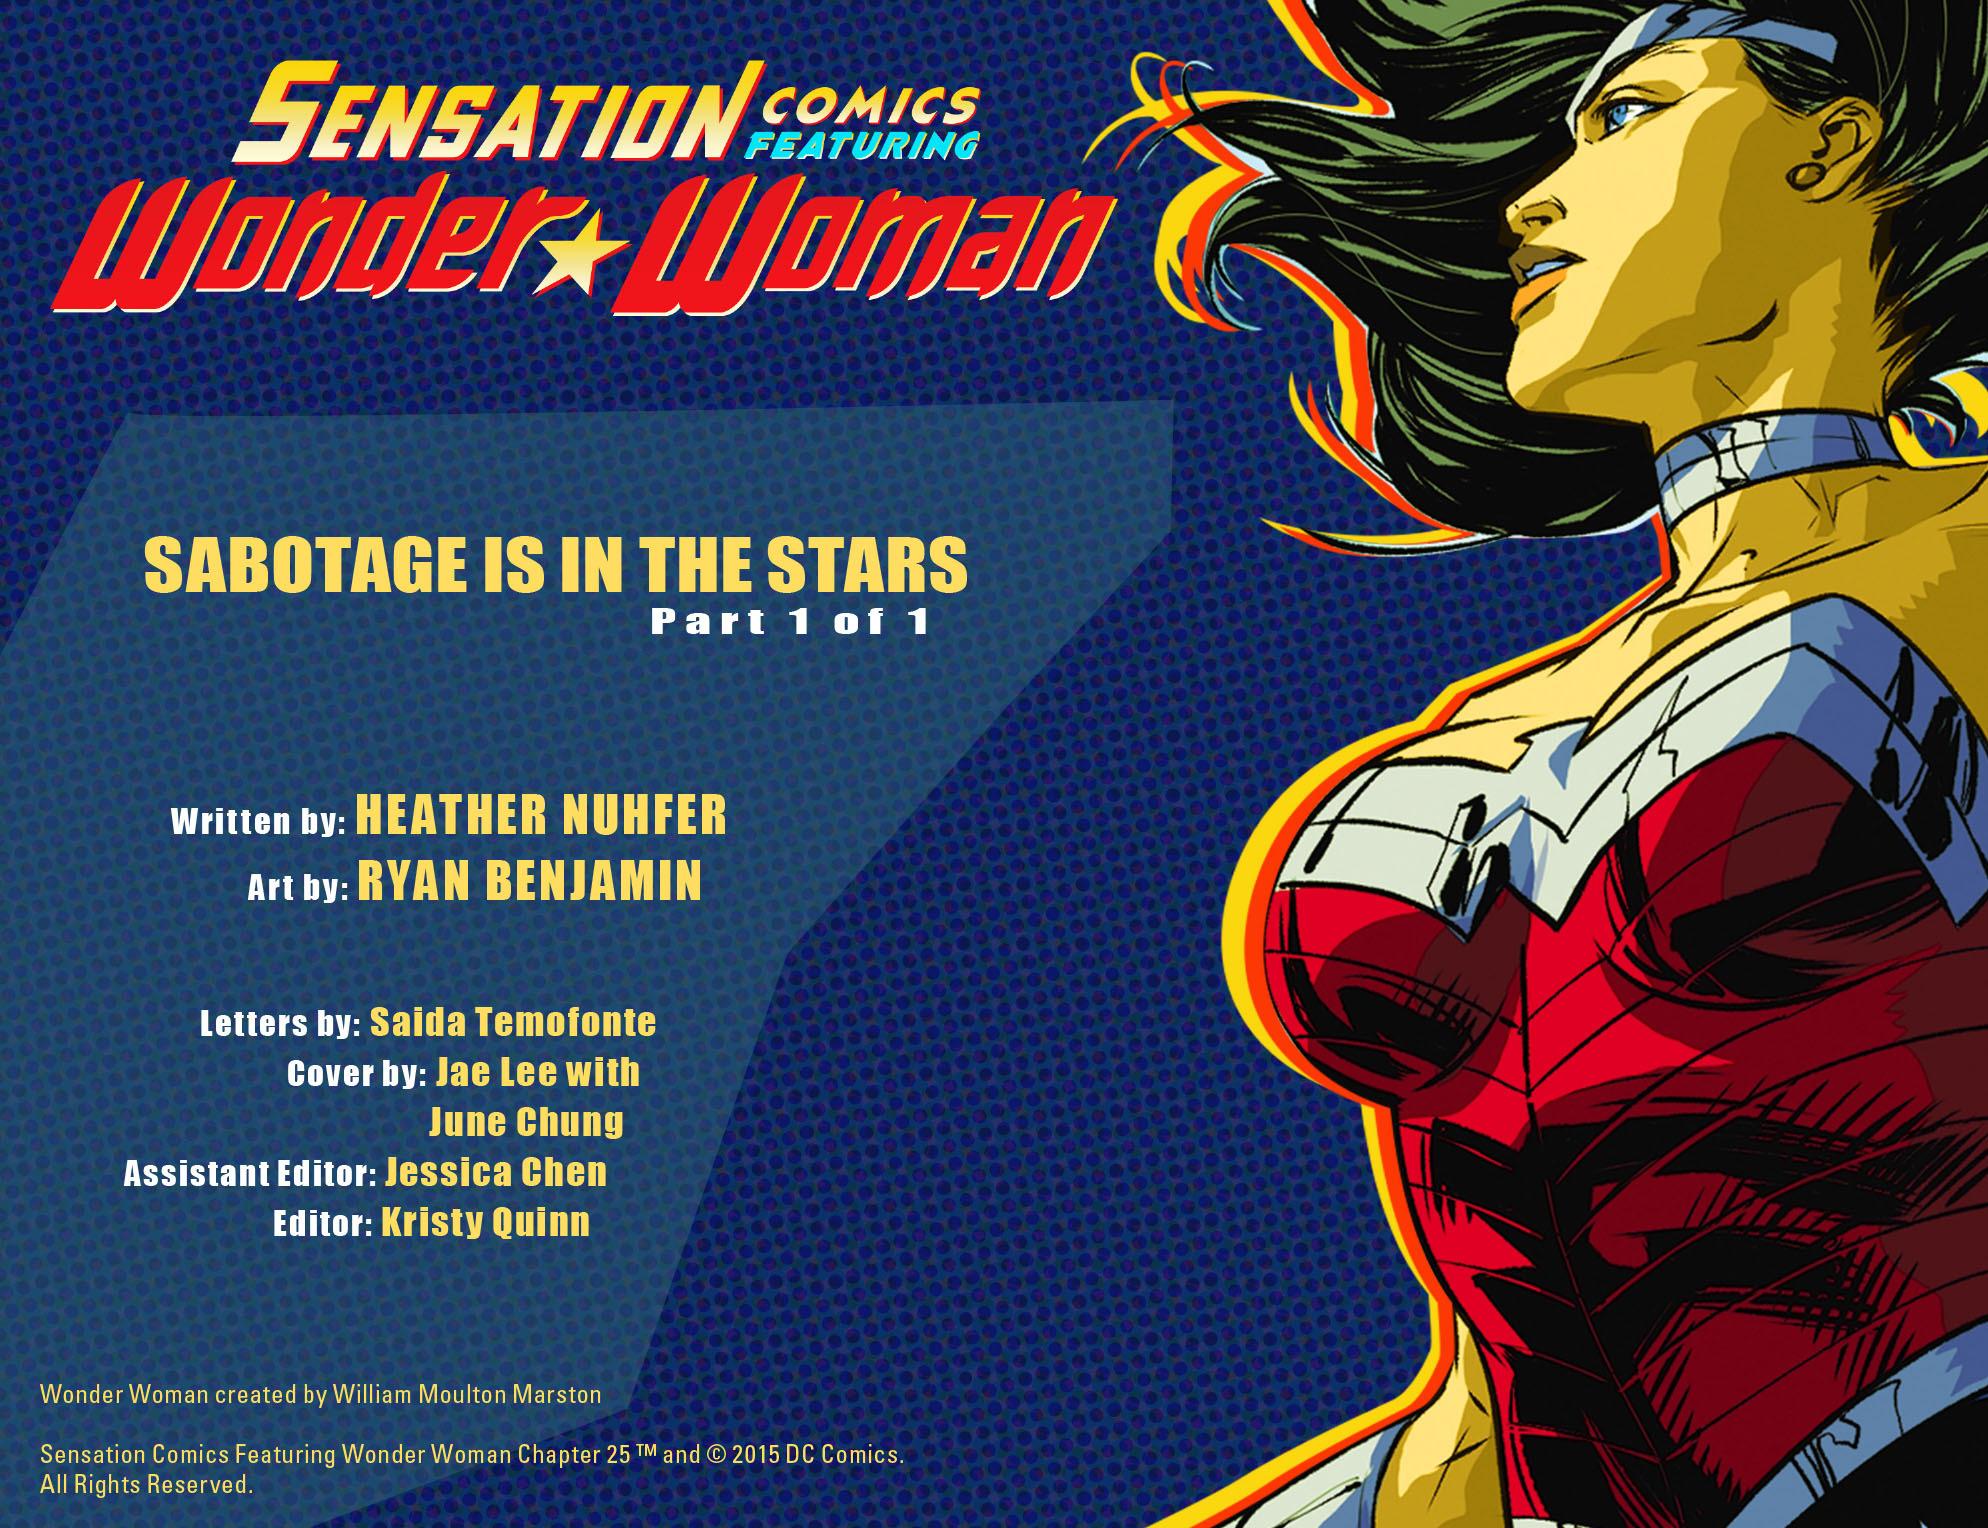 Read online Sensation Comics Featuring Wonder Woman comic -  Issue #25 - 2